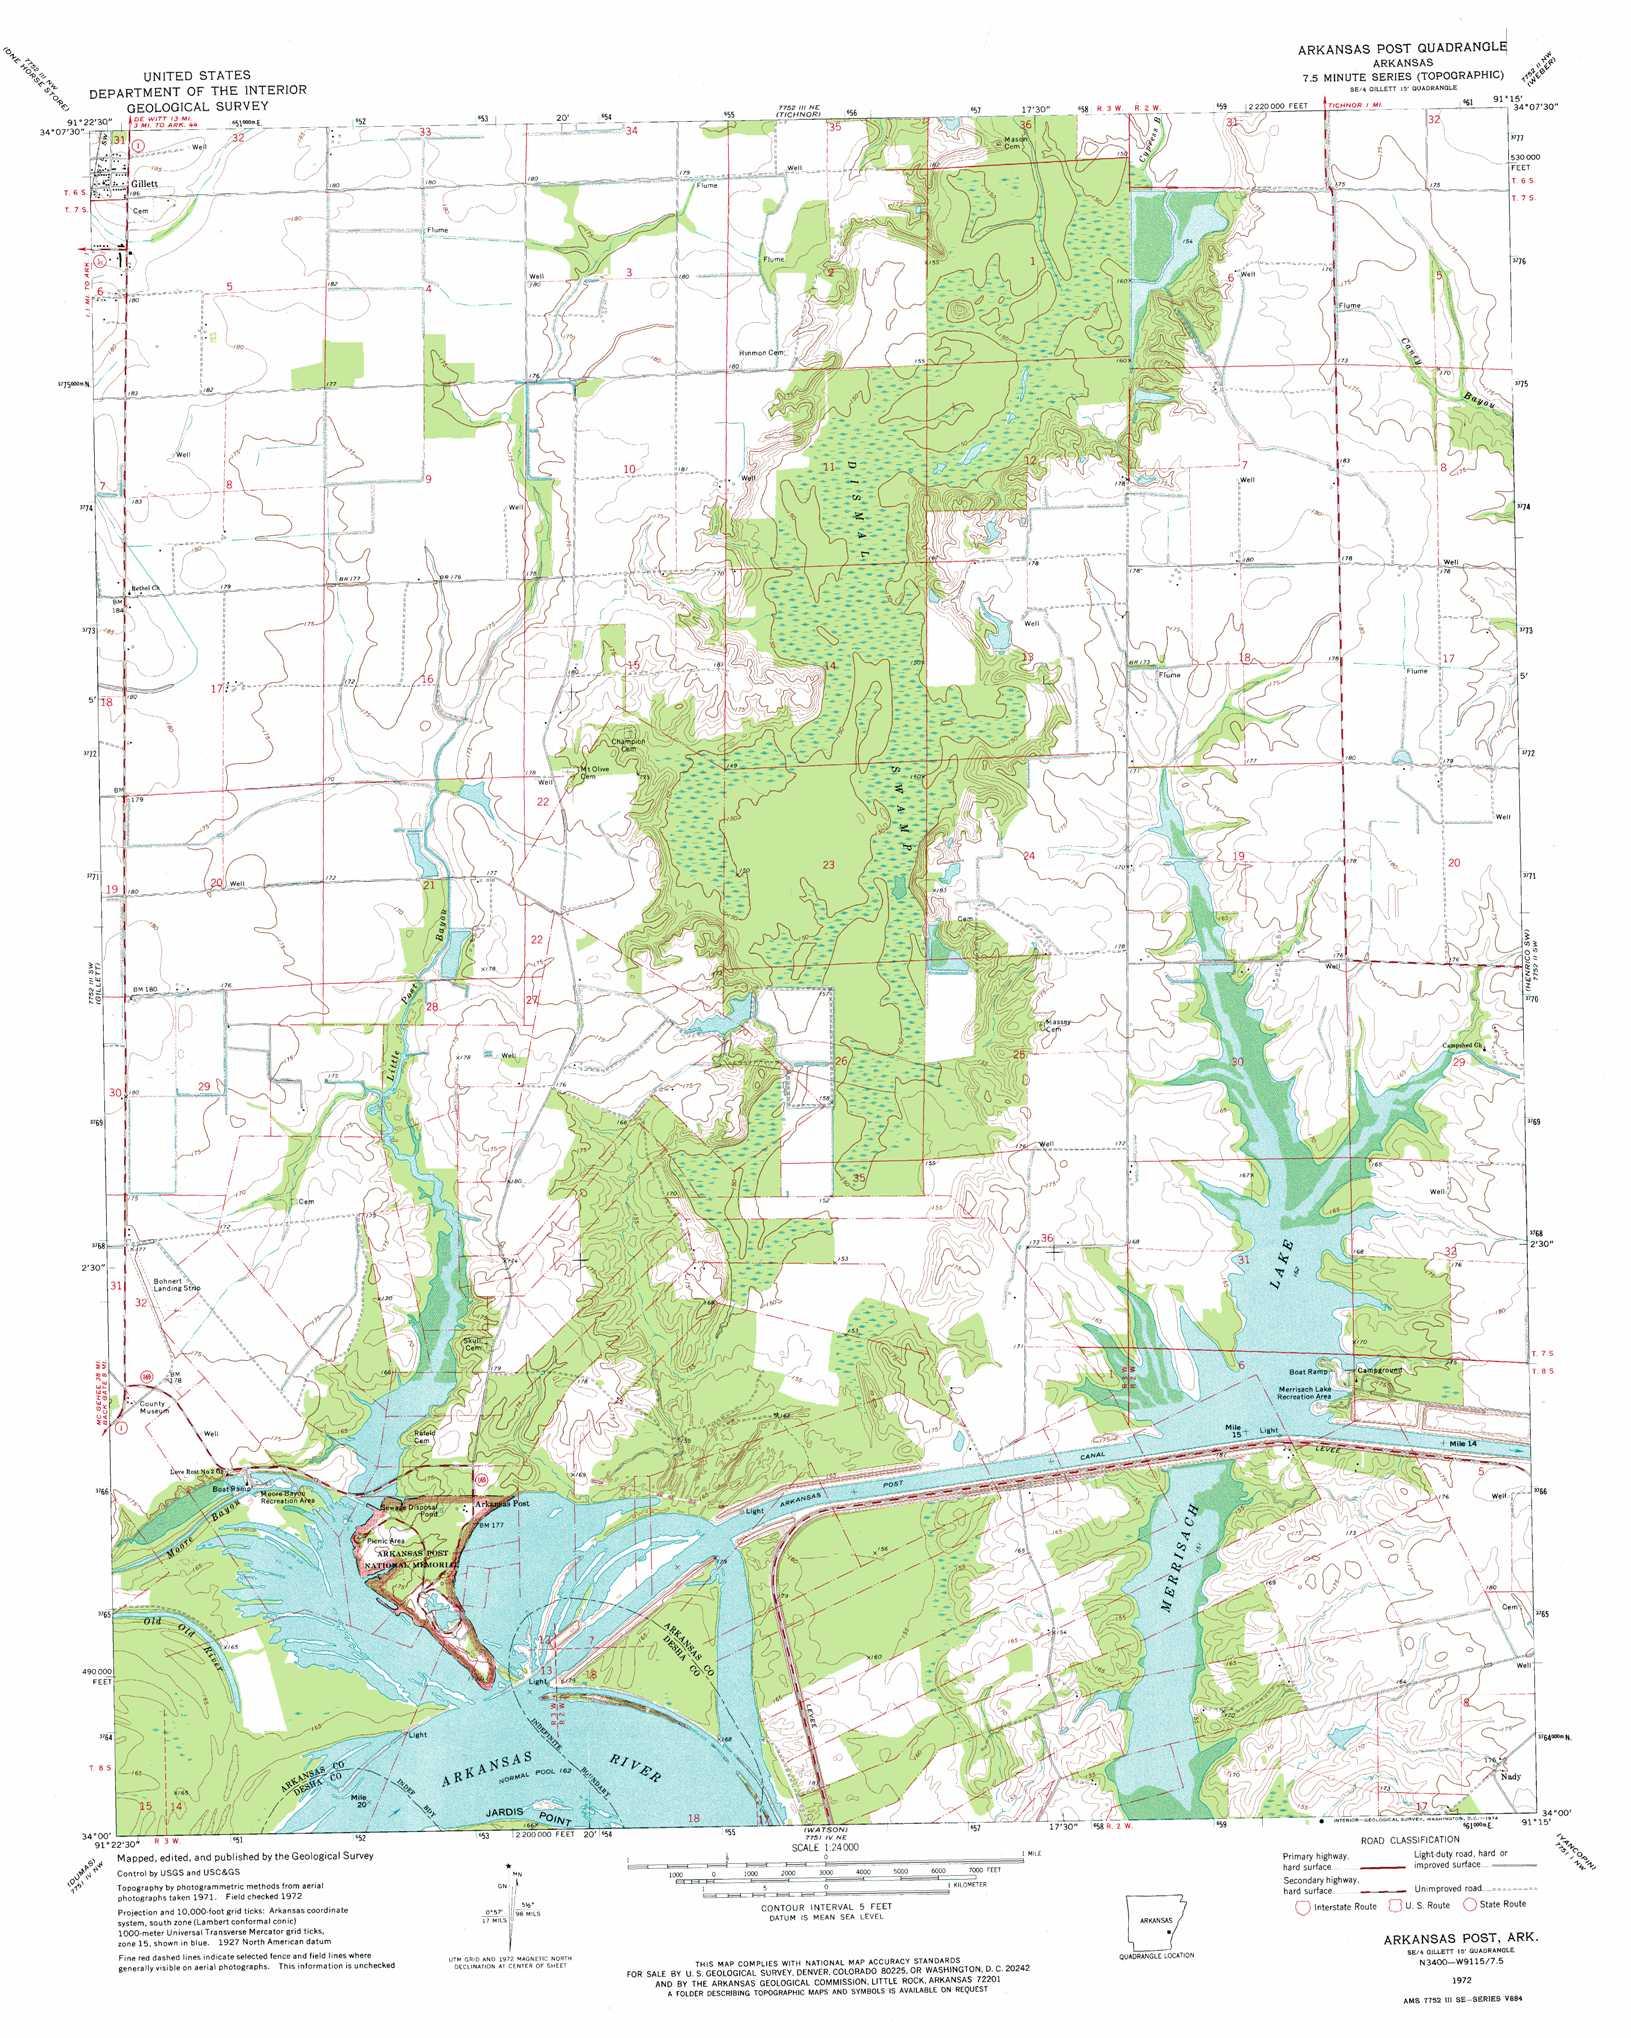 Arkansas Post Topographic Map AR - USGS Topo Quad 34091a3